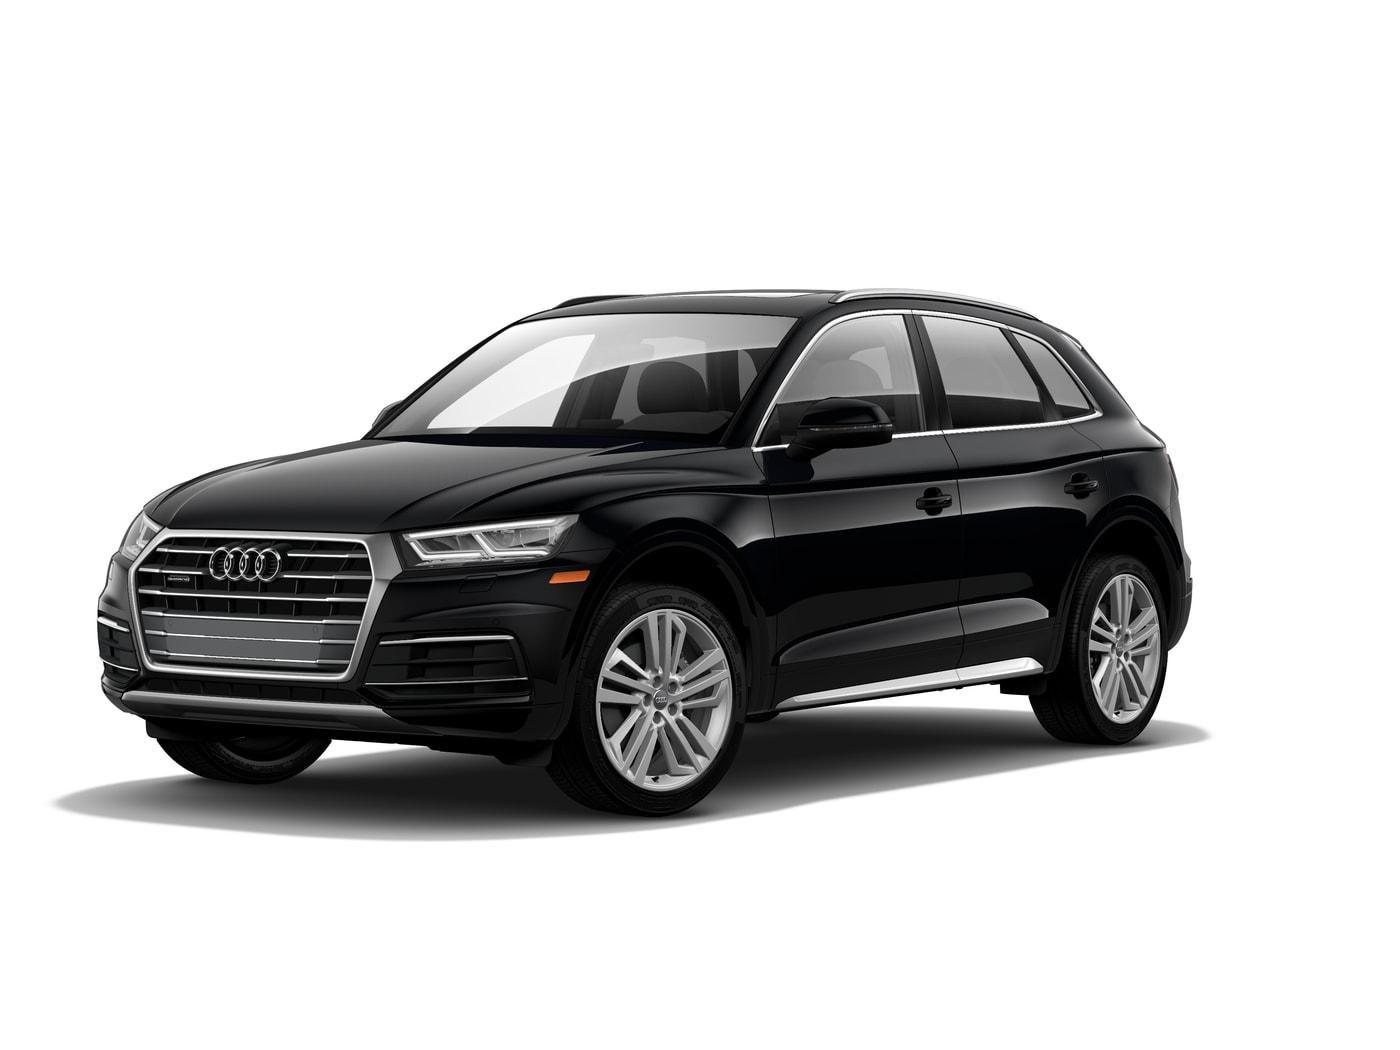 New 2019 Audi Q5 2.0T Premium Plus SUV near Hartford